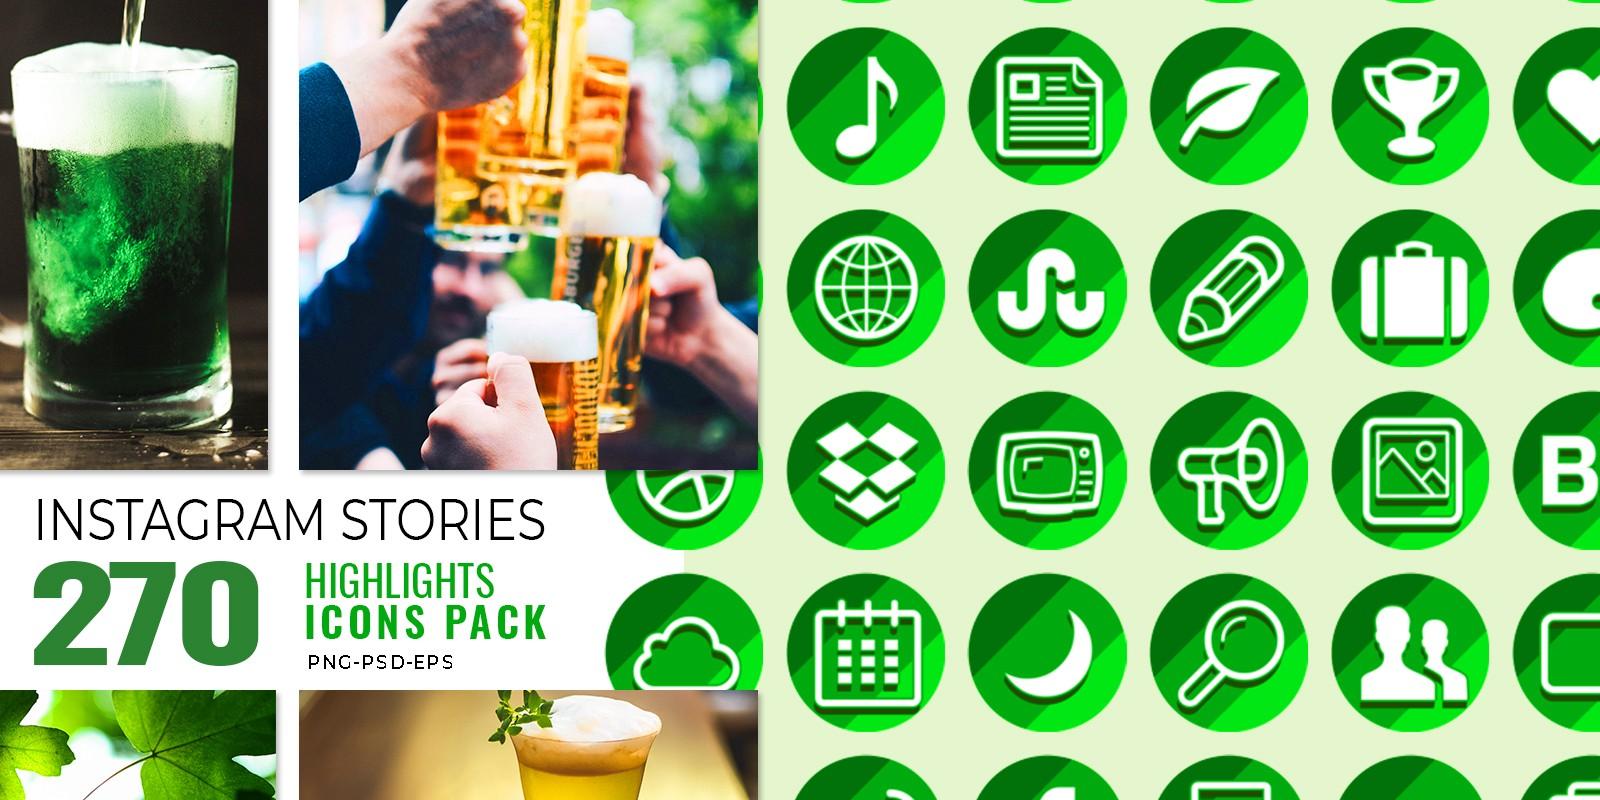 270 St Patrics Day Insta - Story Highlights Icons